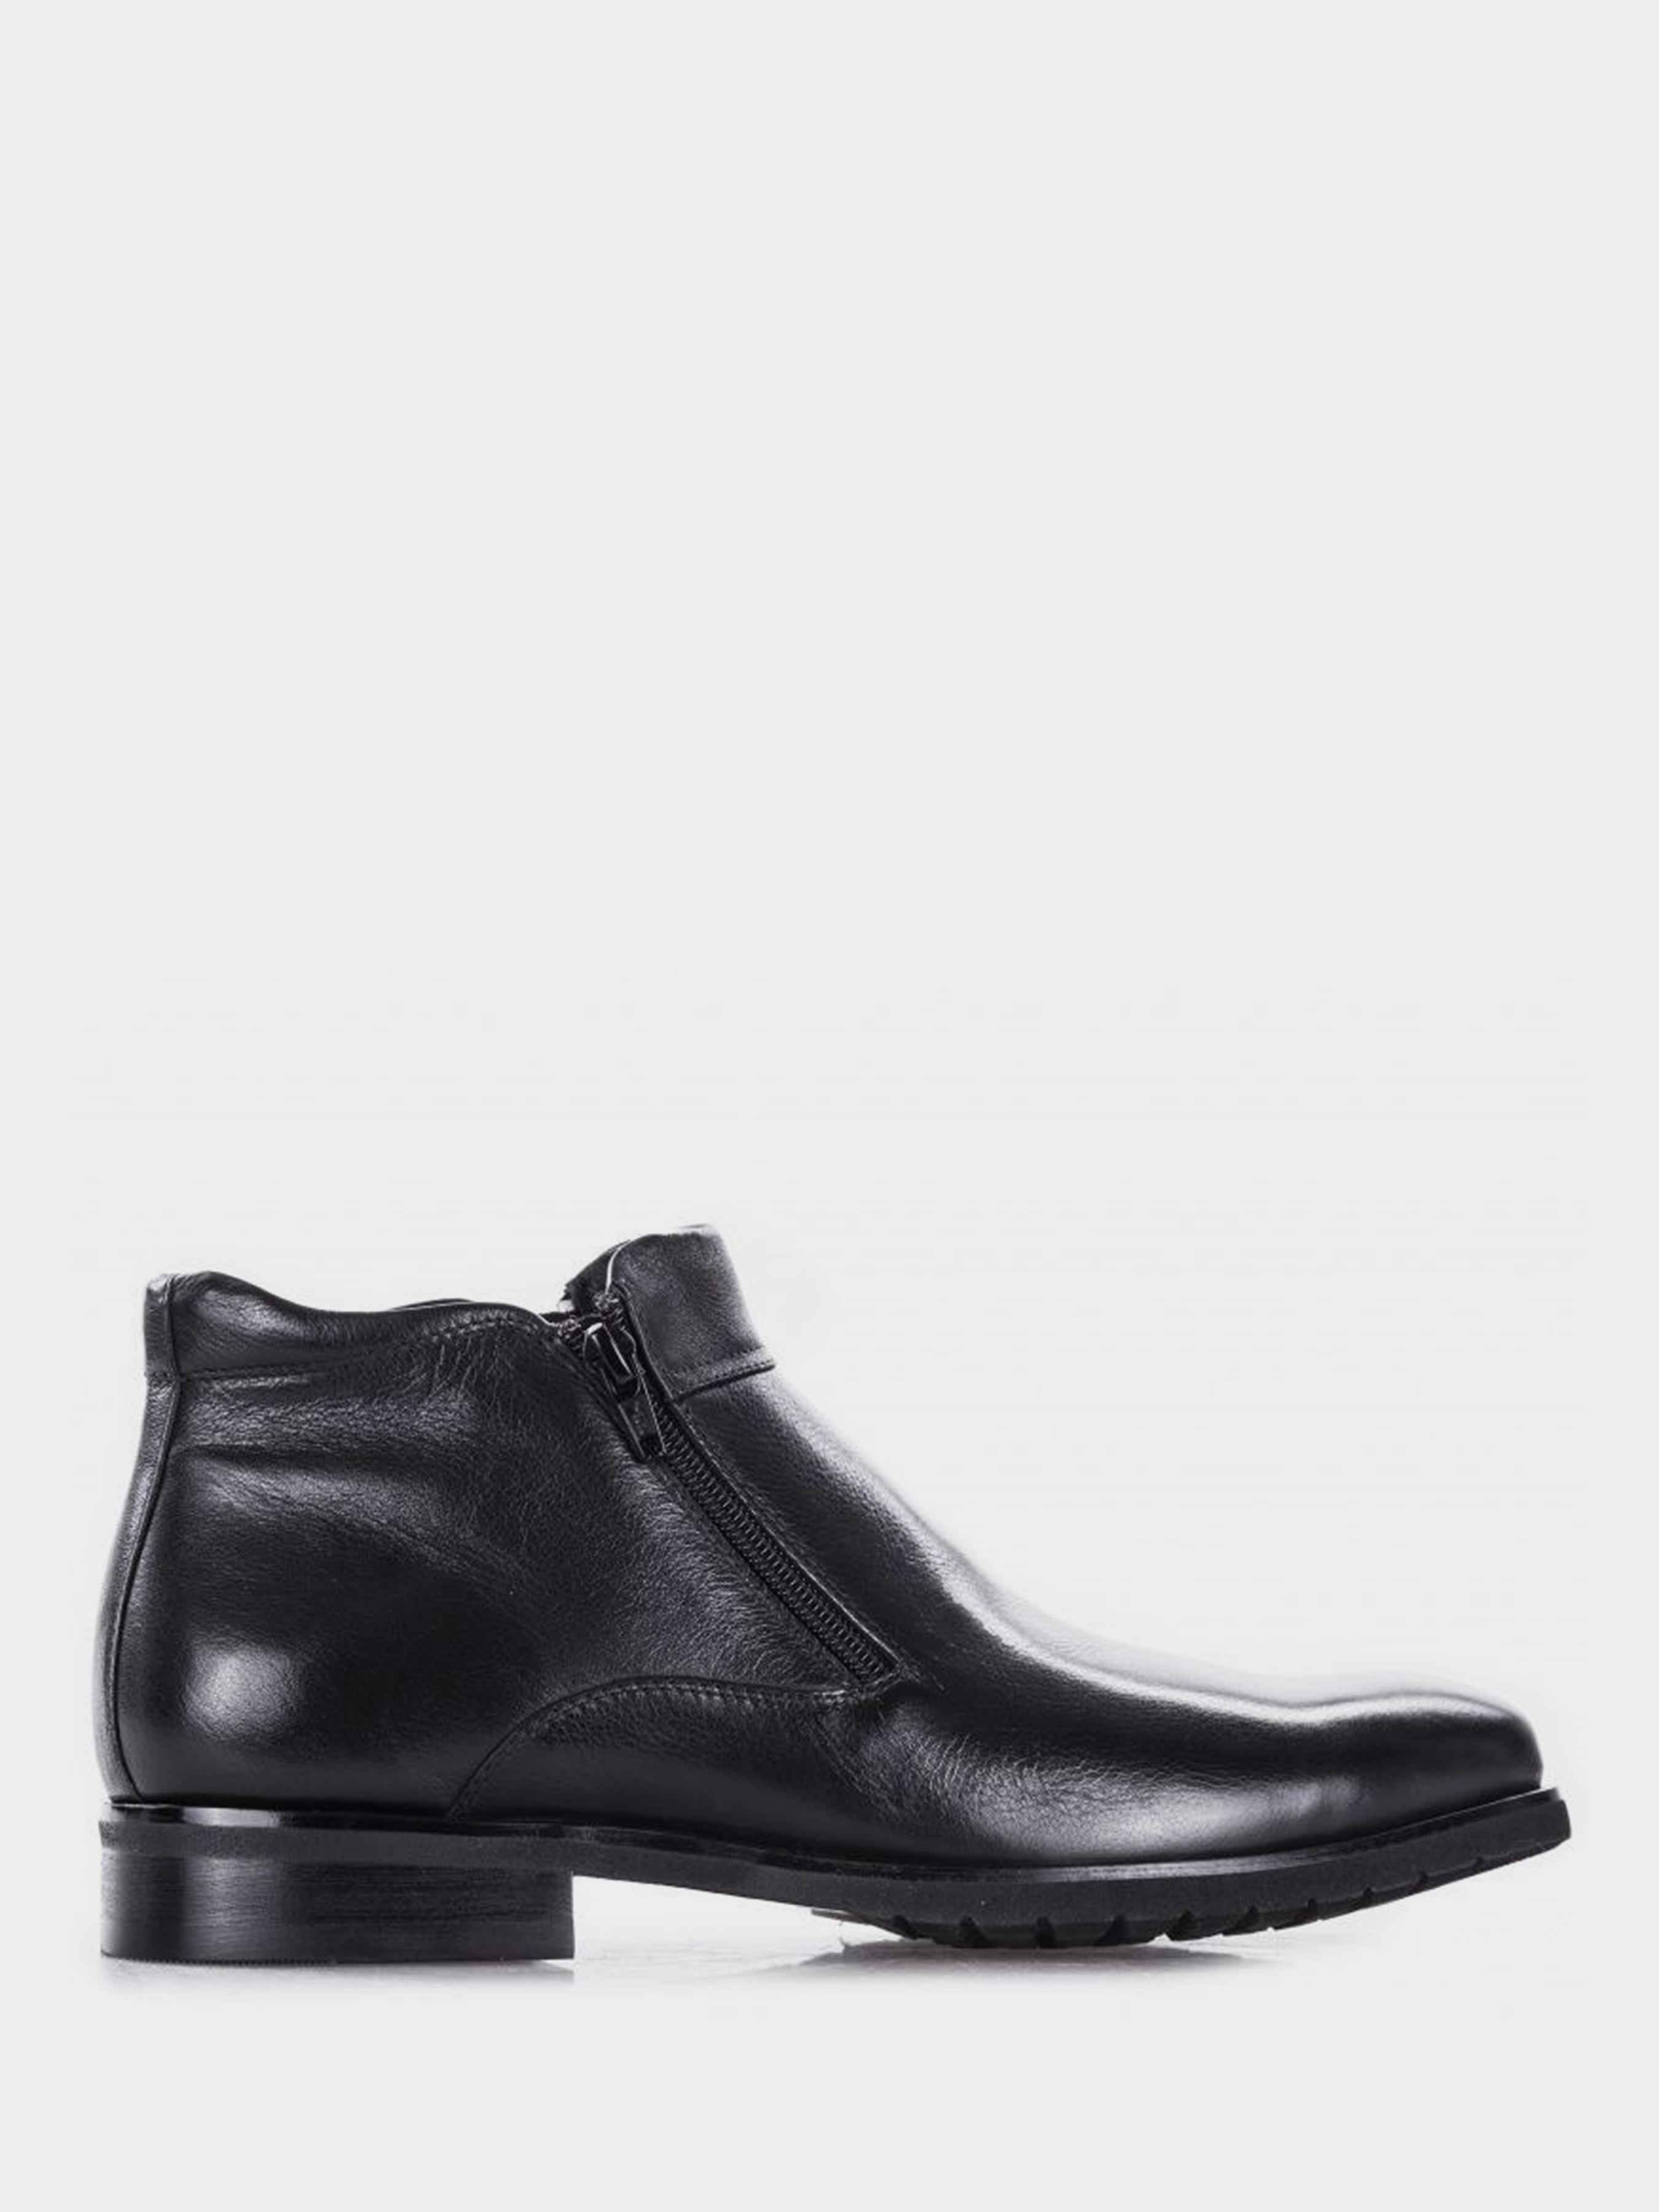 Ботинки для мужчин Braska BR1556 брендовые, 2017